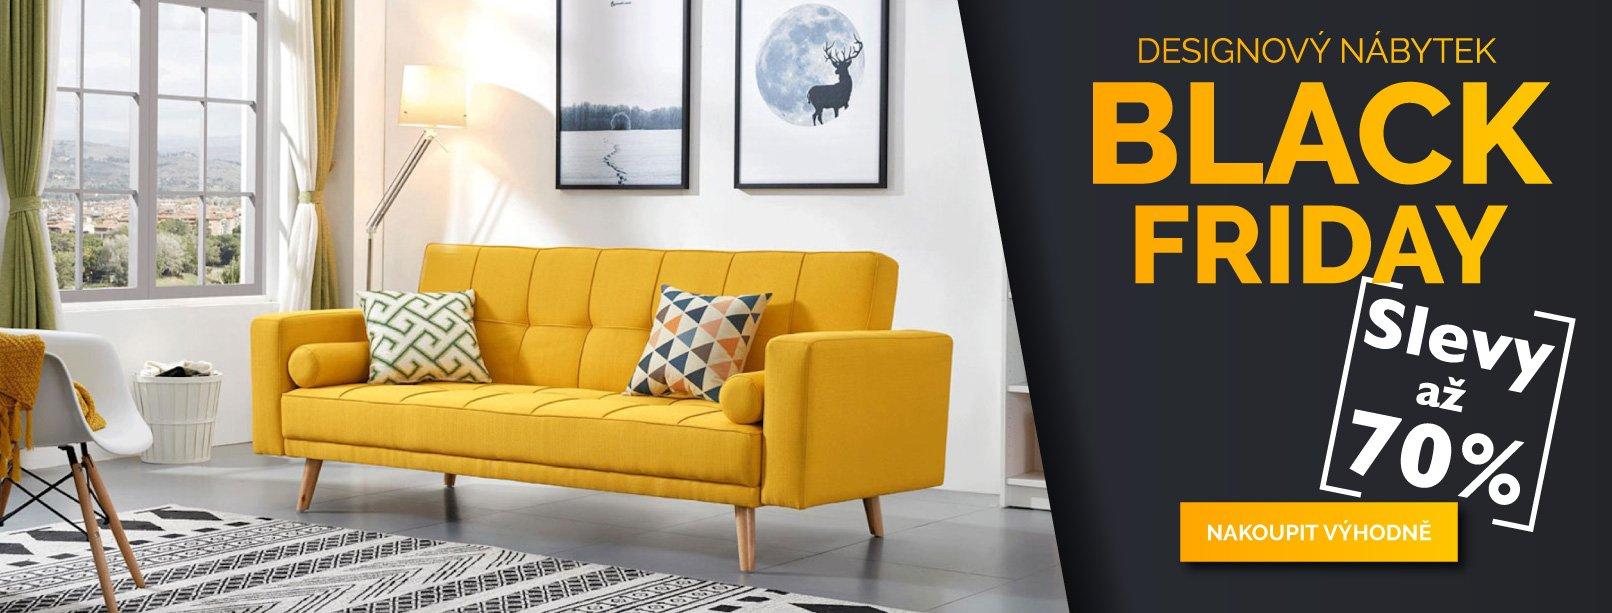 Black Friday - Designový nábytek se slevami až 70 %